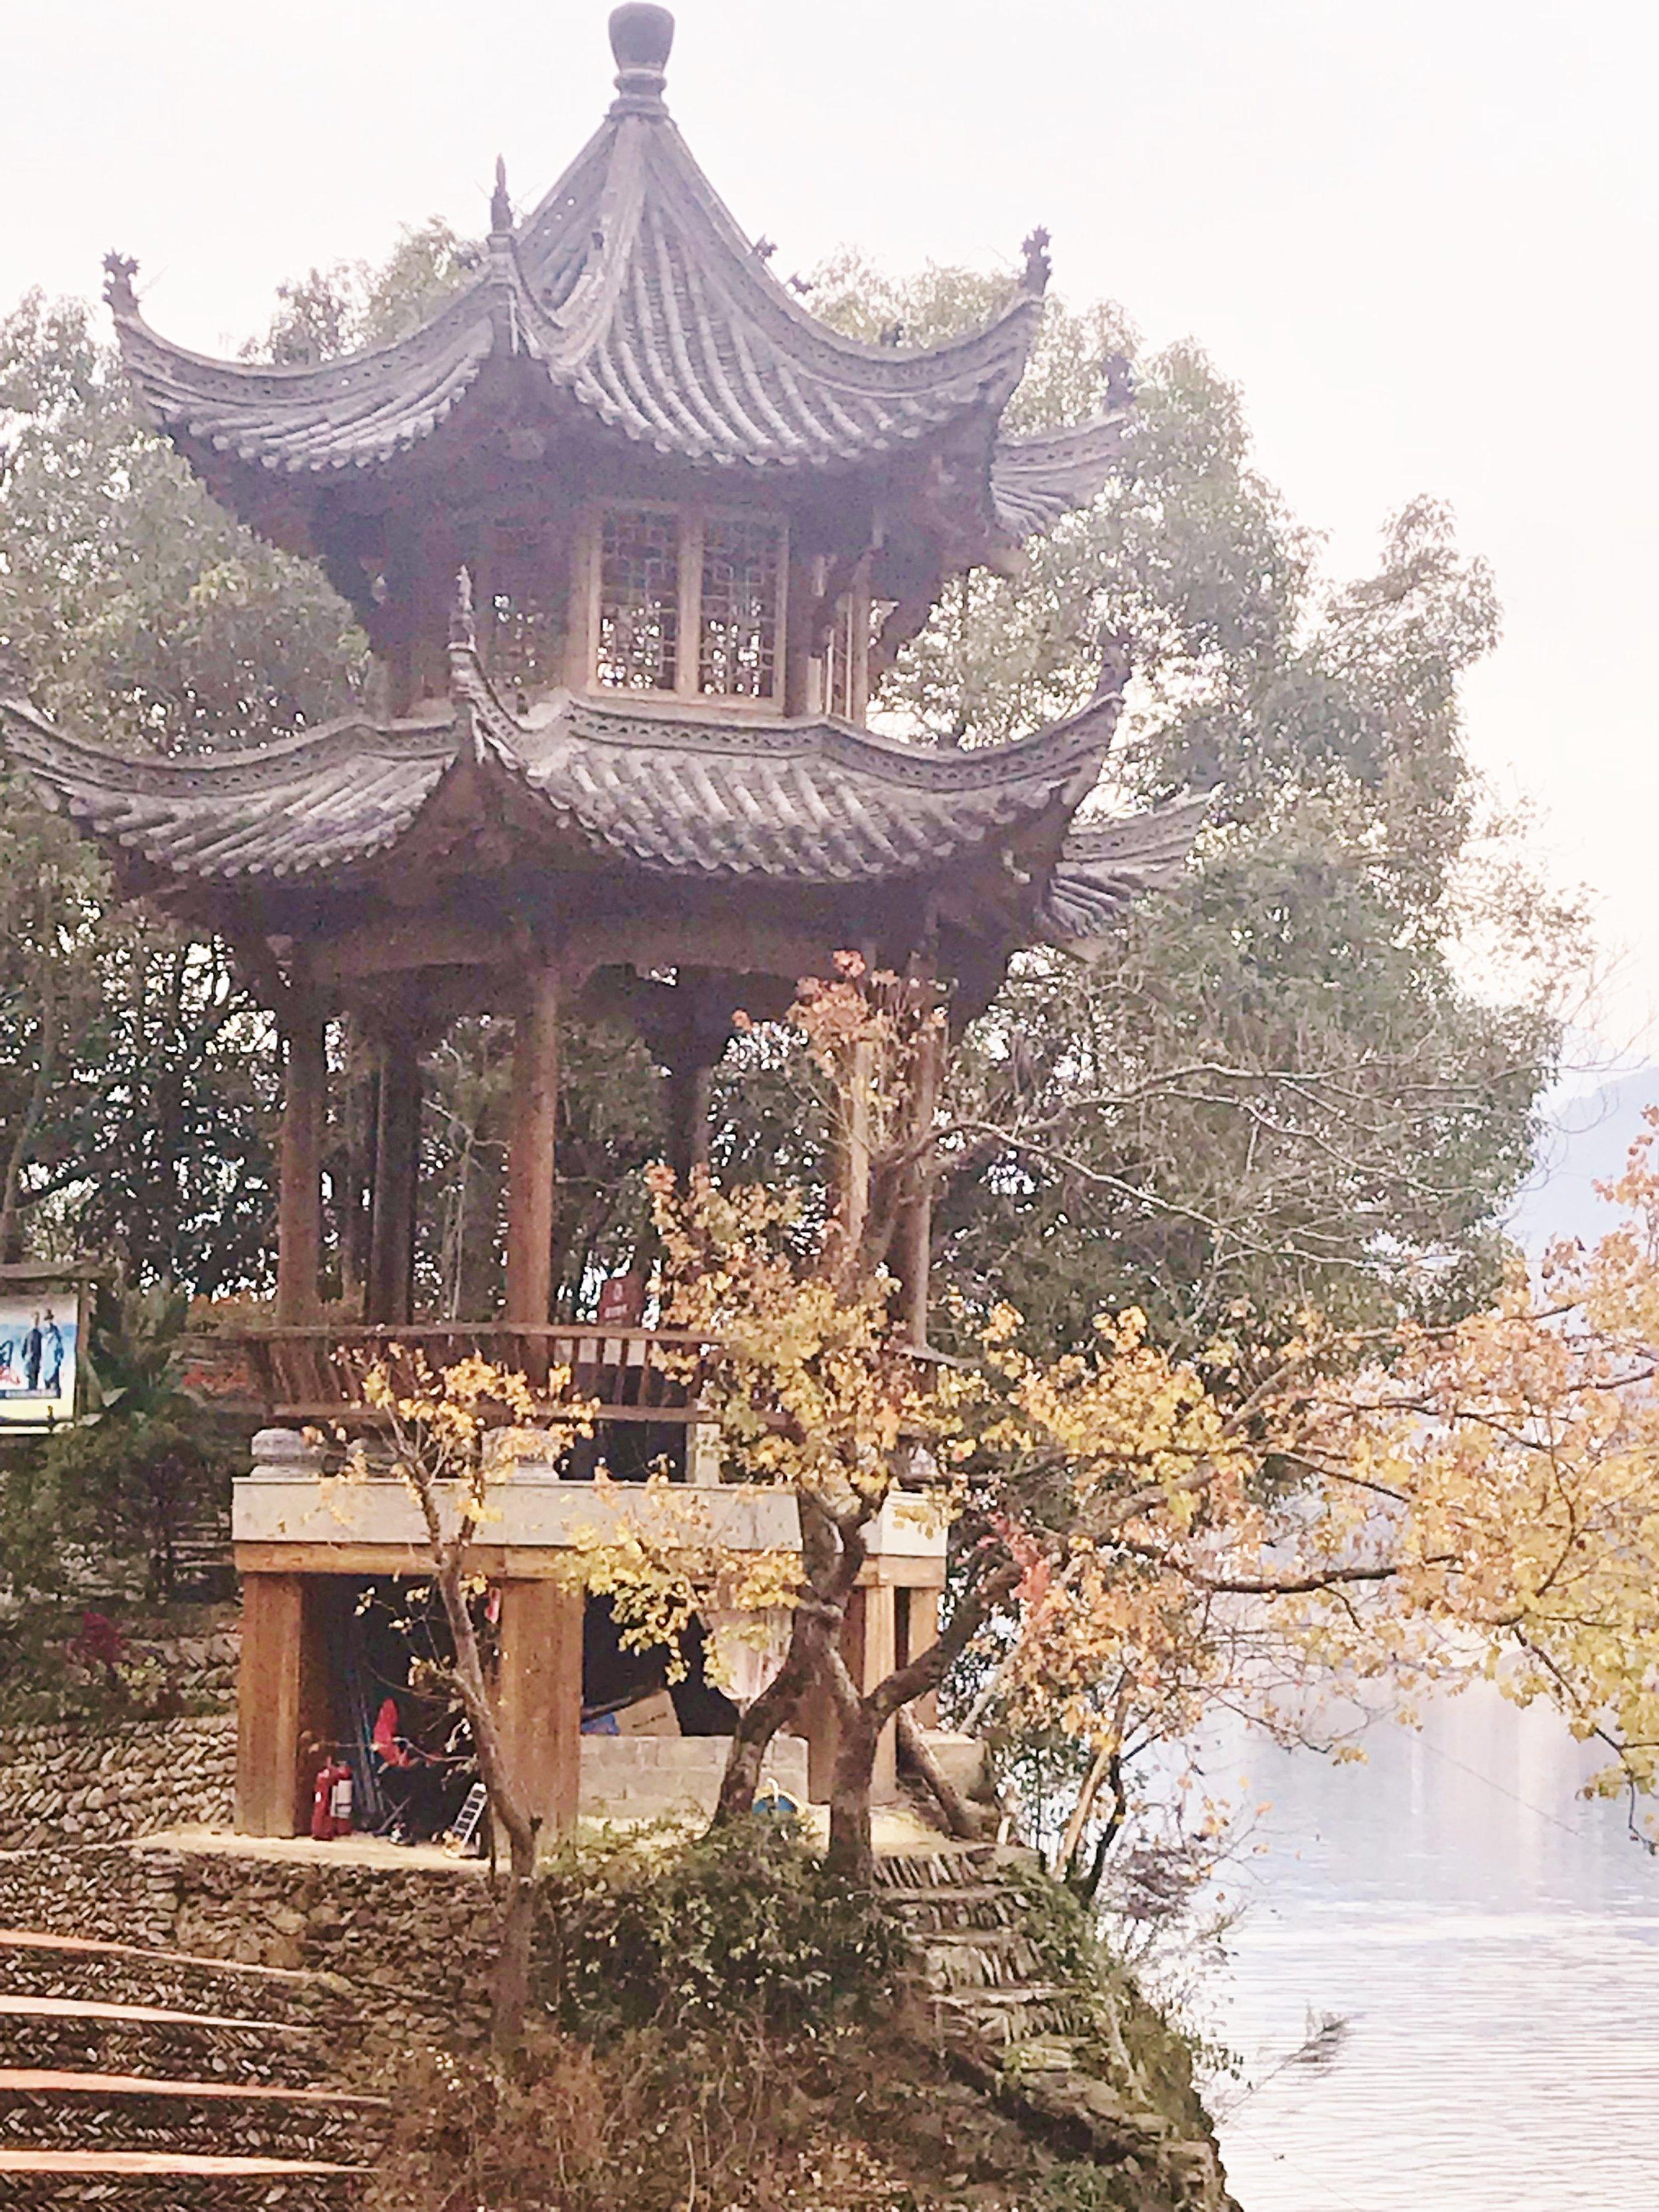 Amphitheater at Shen Du River